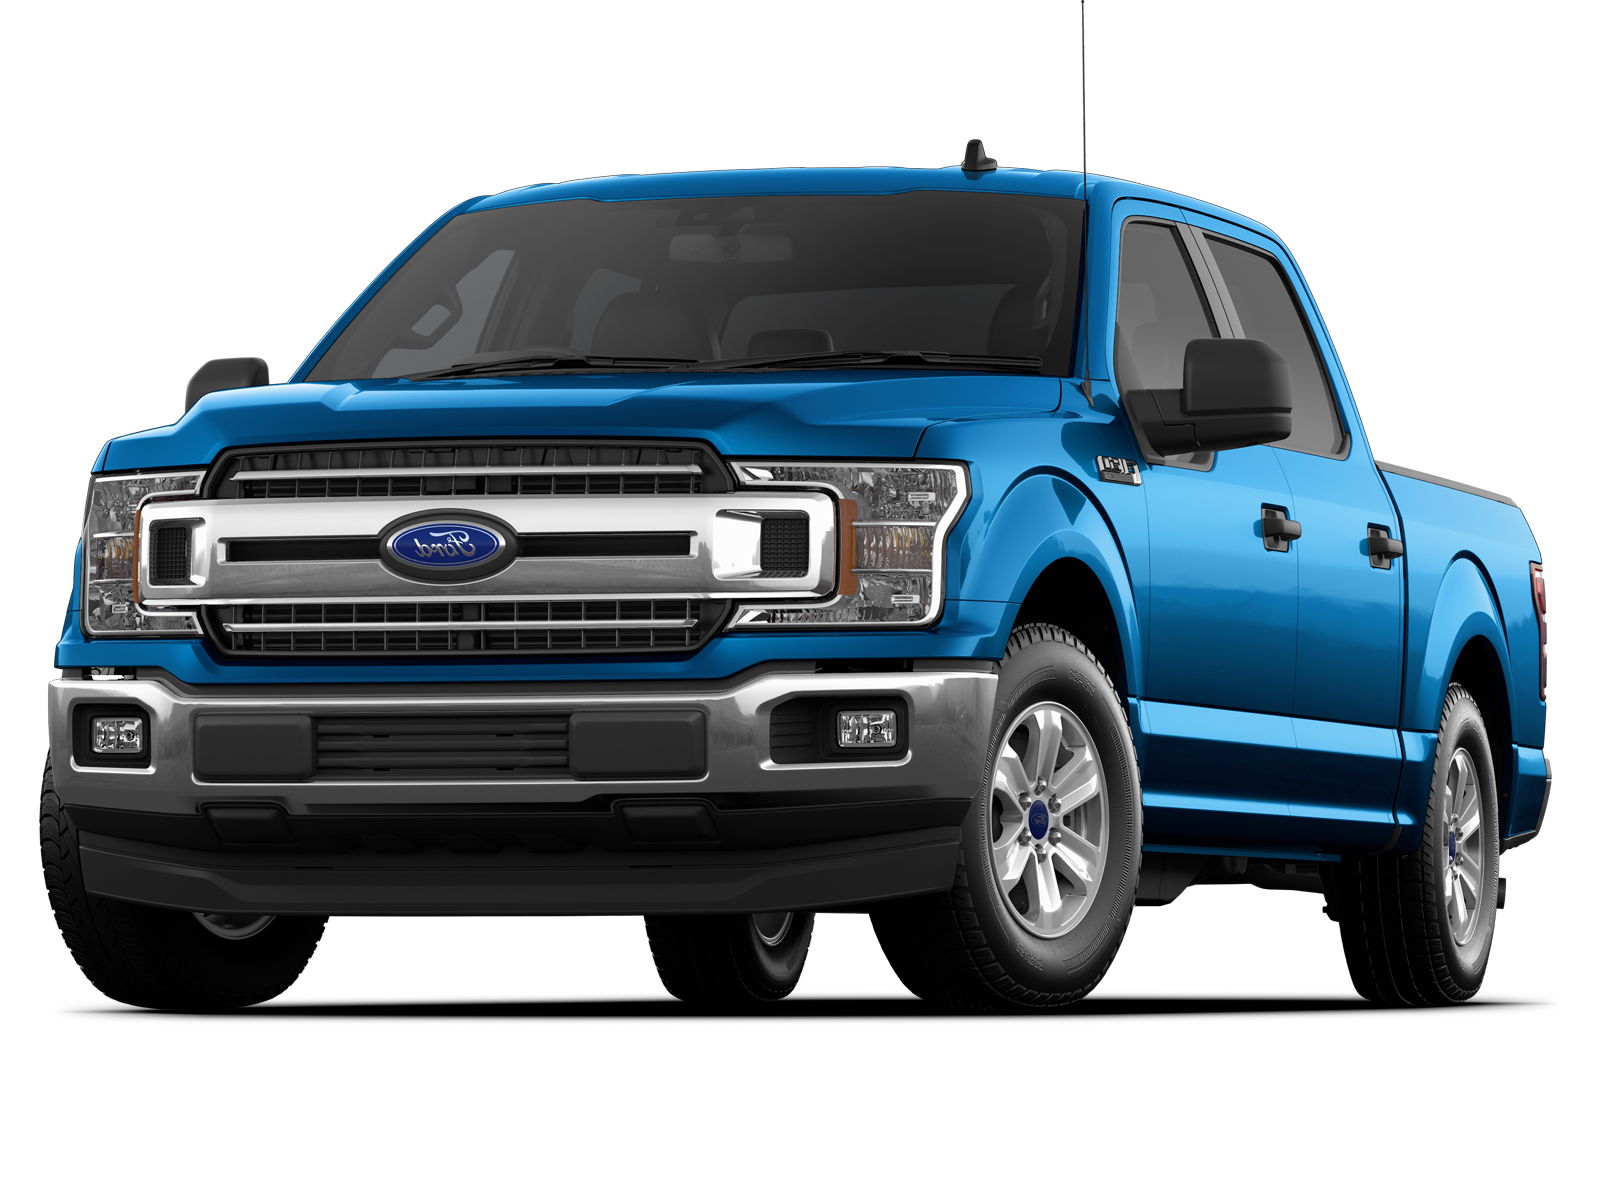 Buy Ford Used at Larry H. Miller Used Car Supermarket in Orem